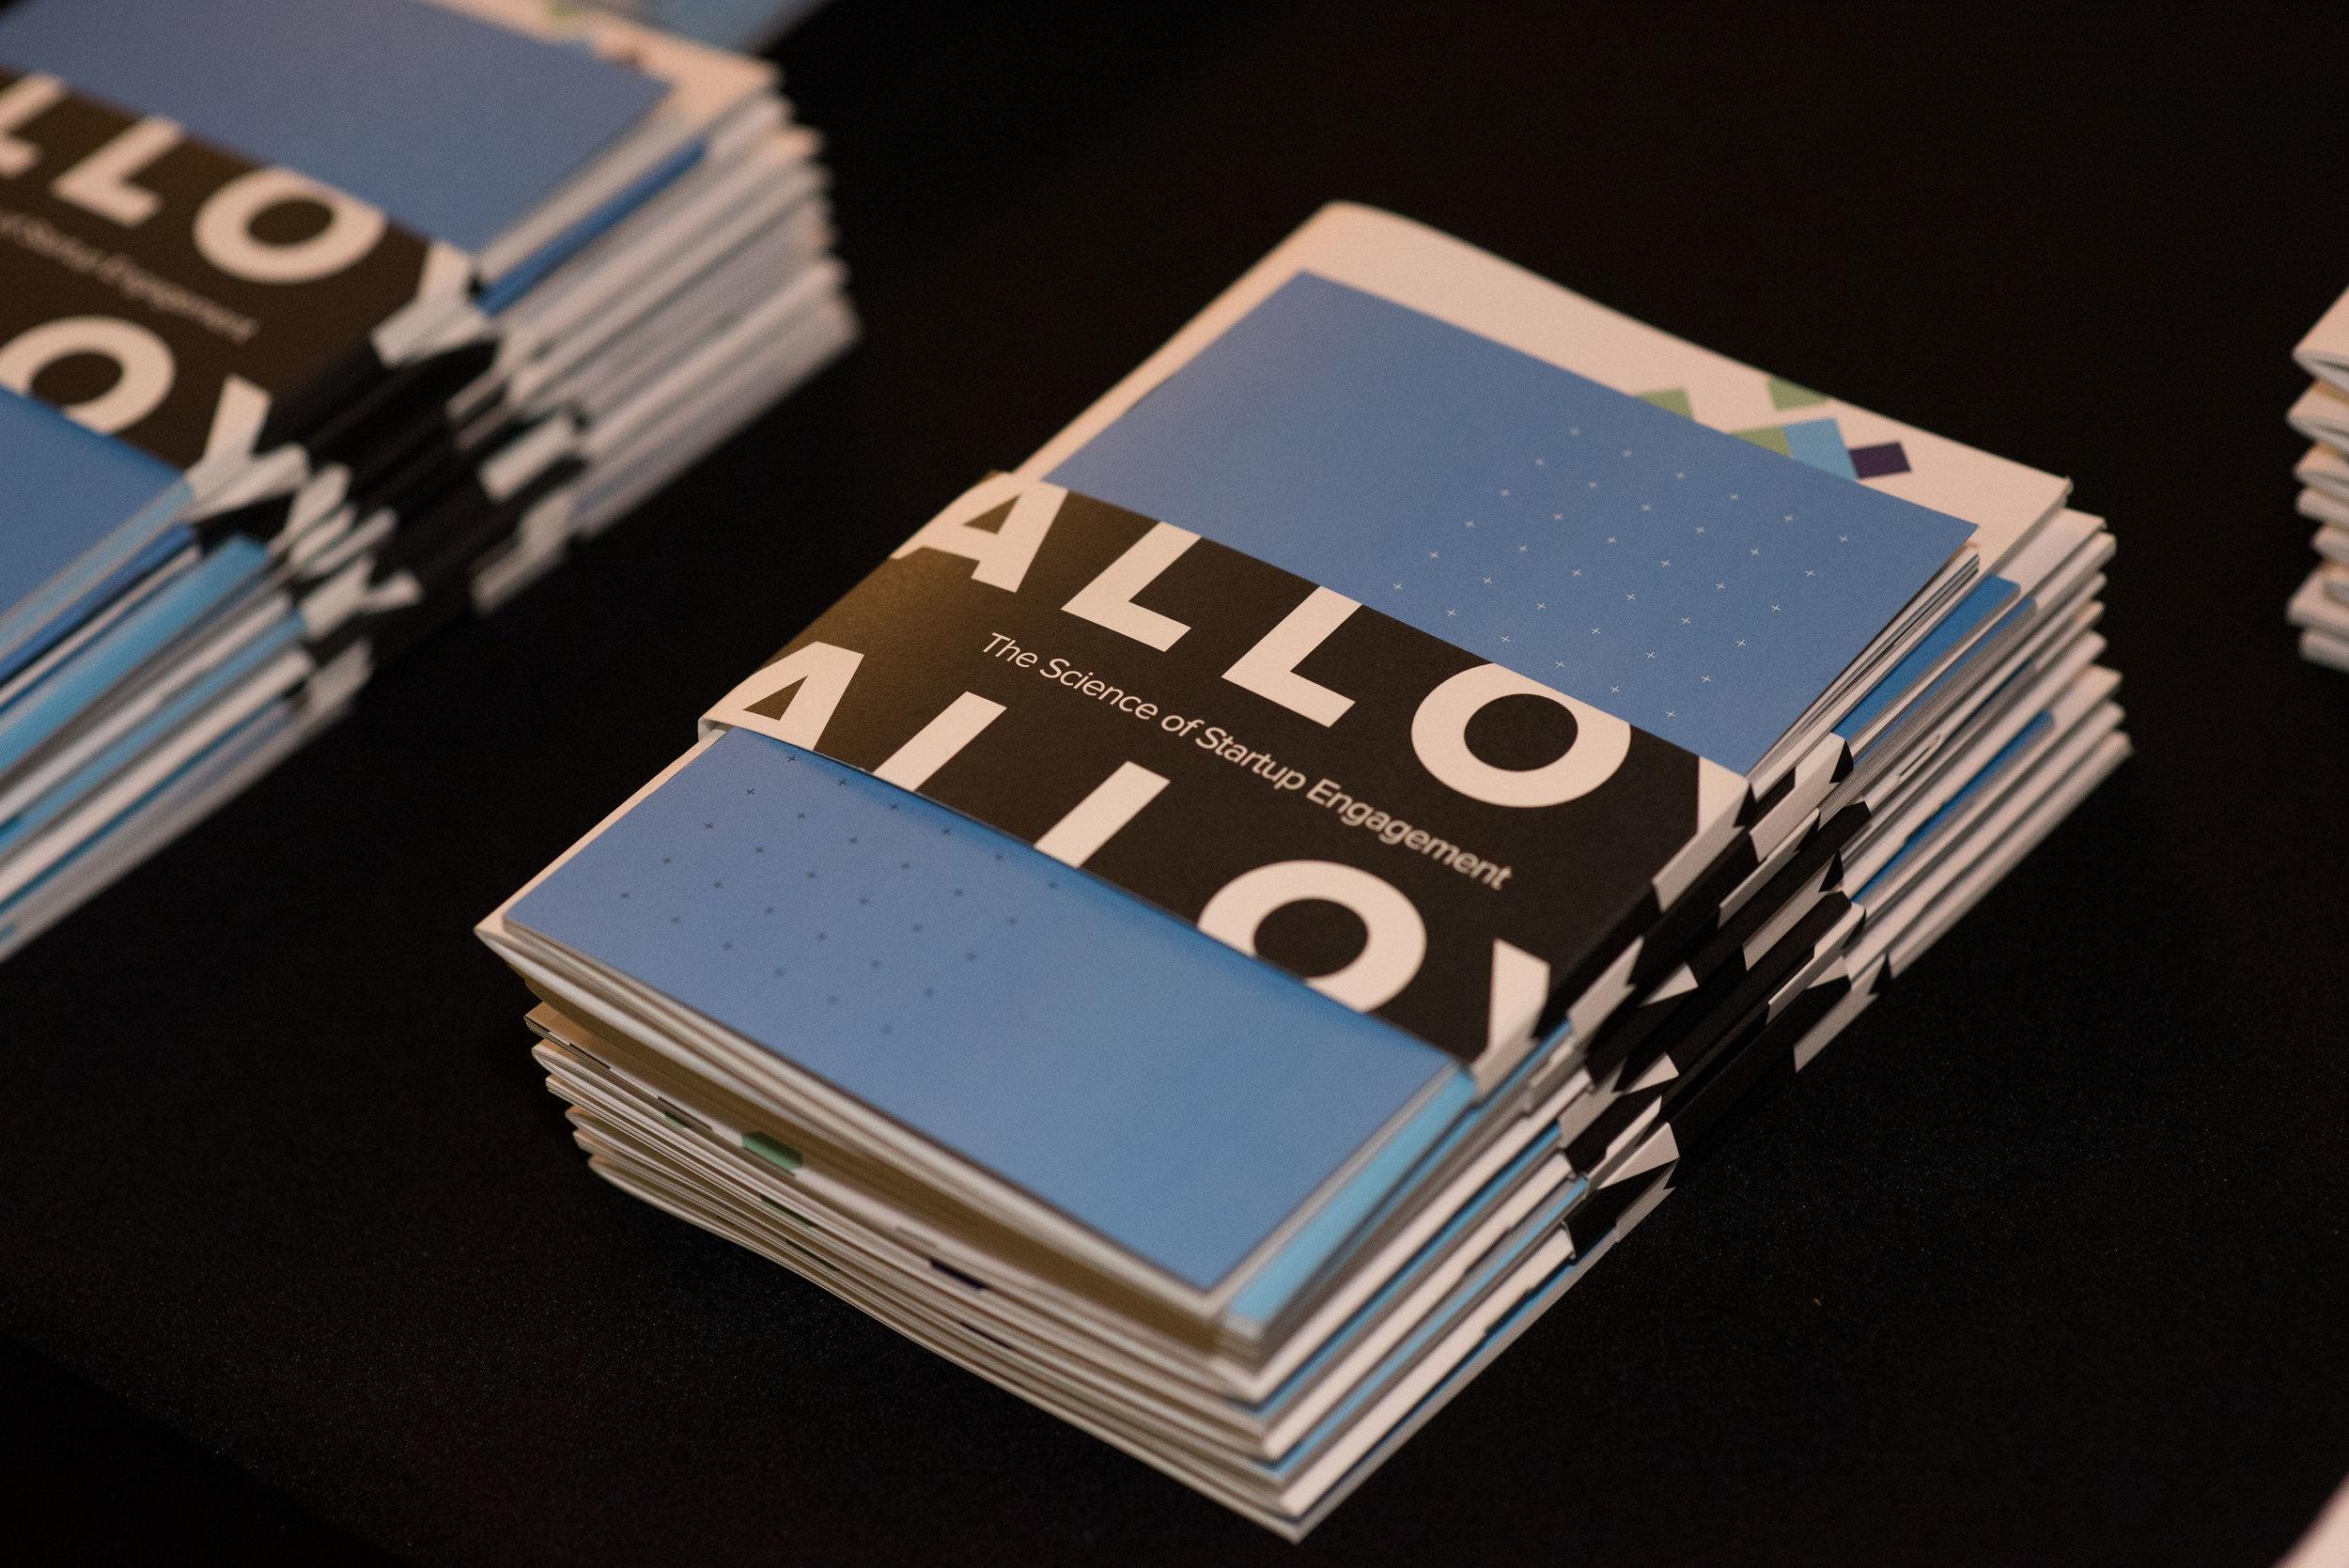 alloy-19-sf-jazz-center178.jpg